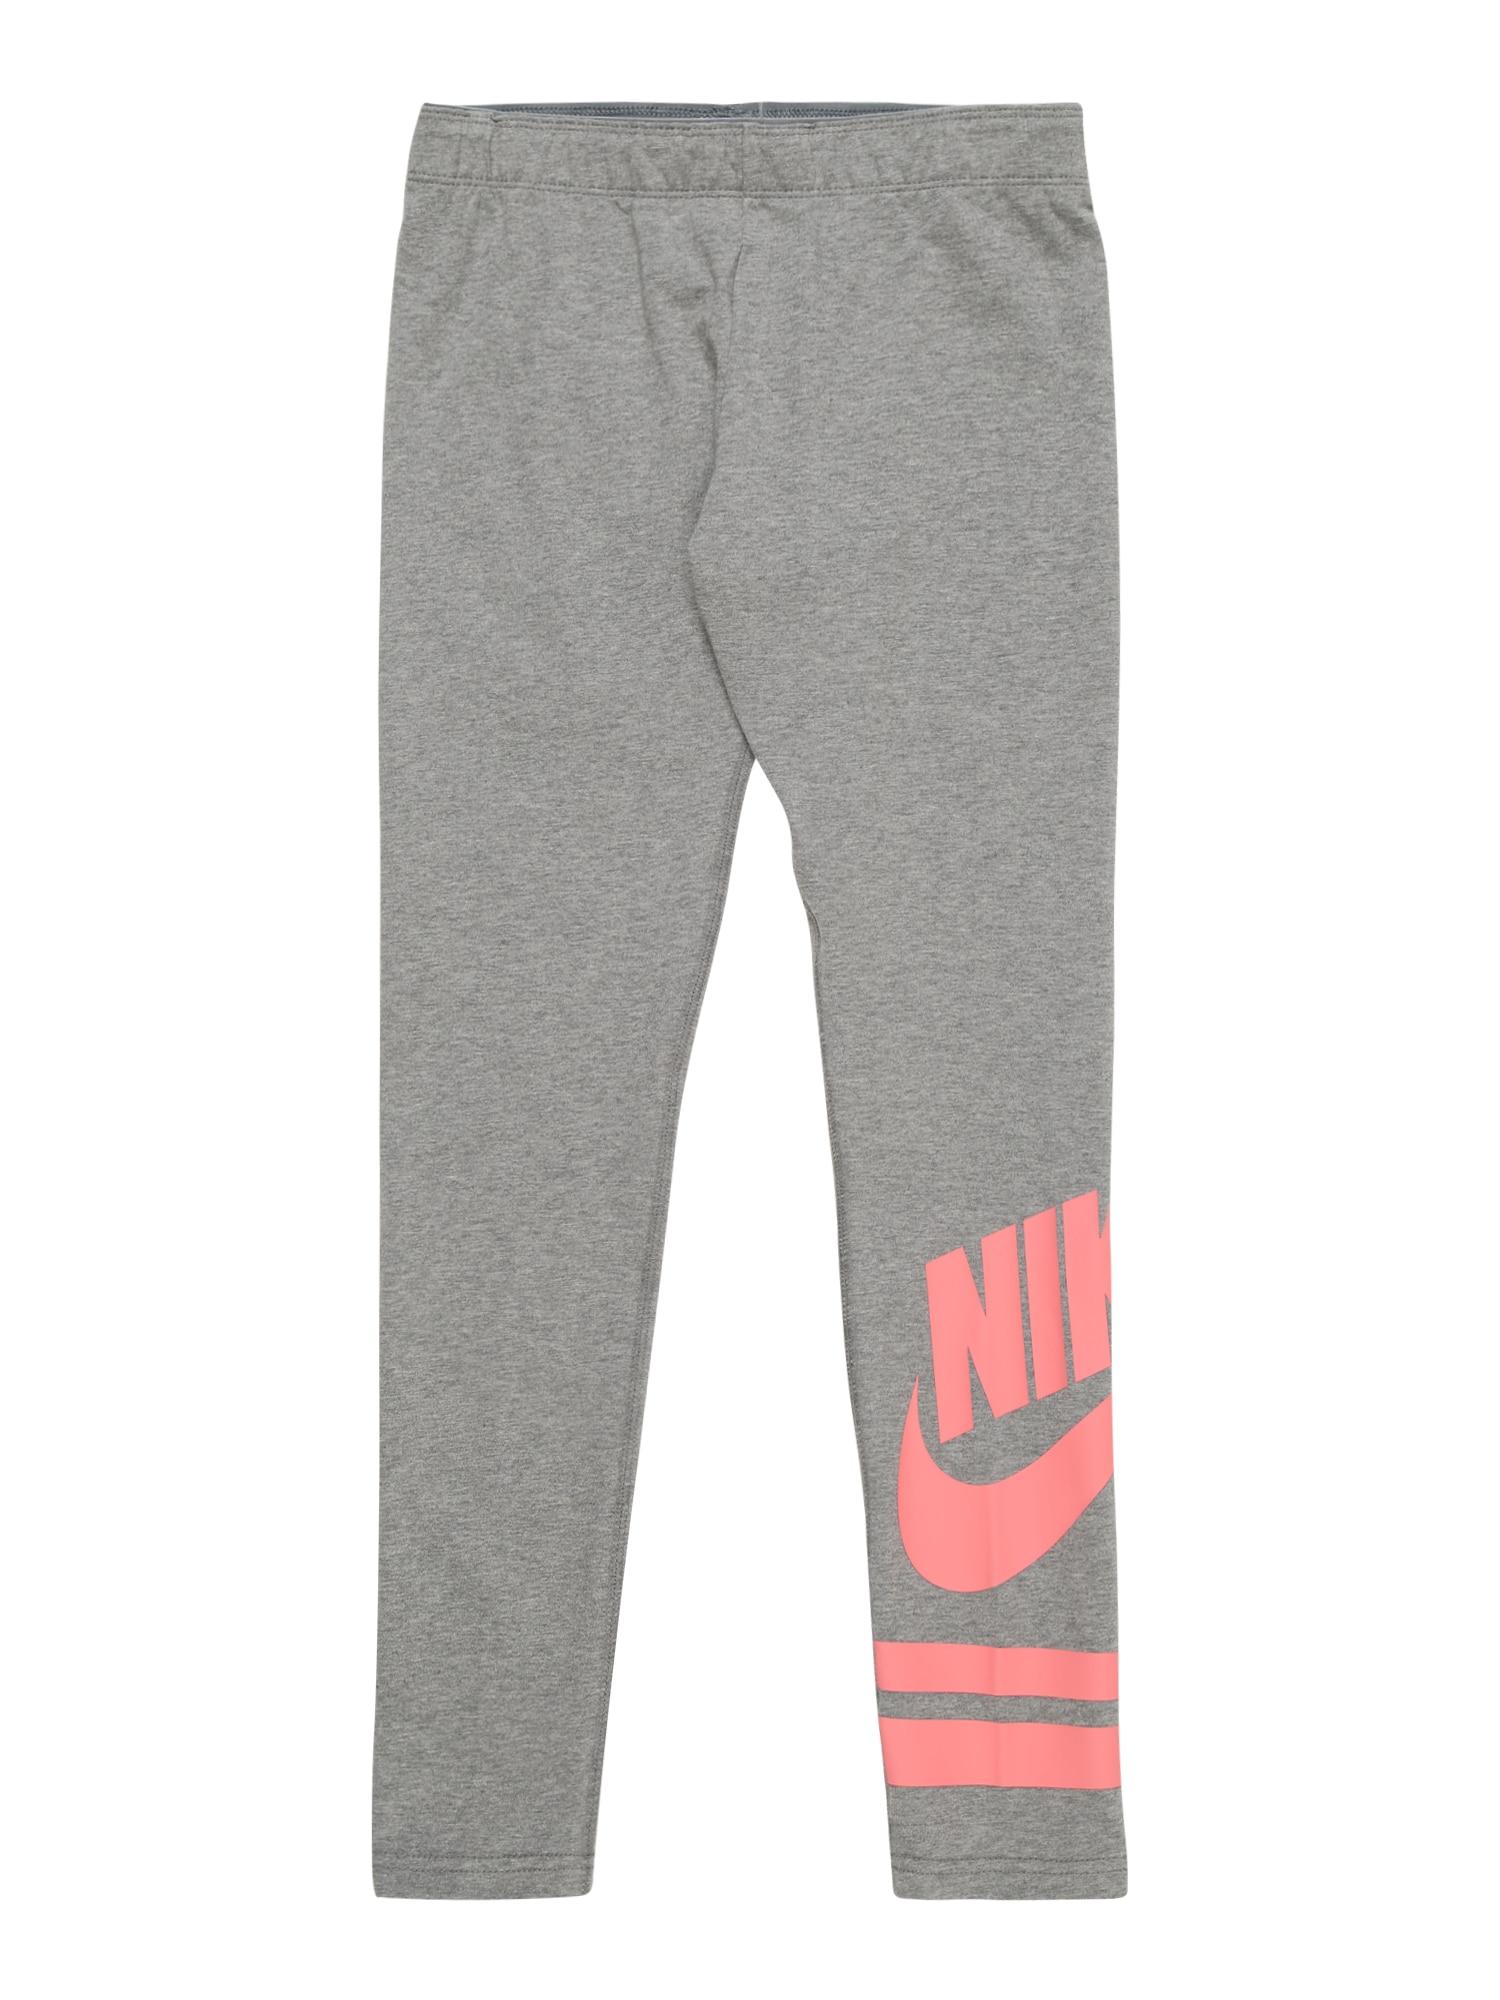 Nike Sportswear Tamprės margai pilka / koralų splava